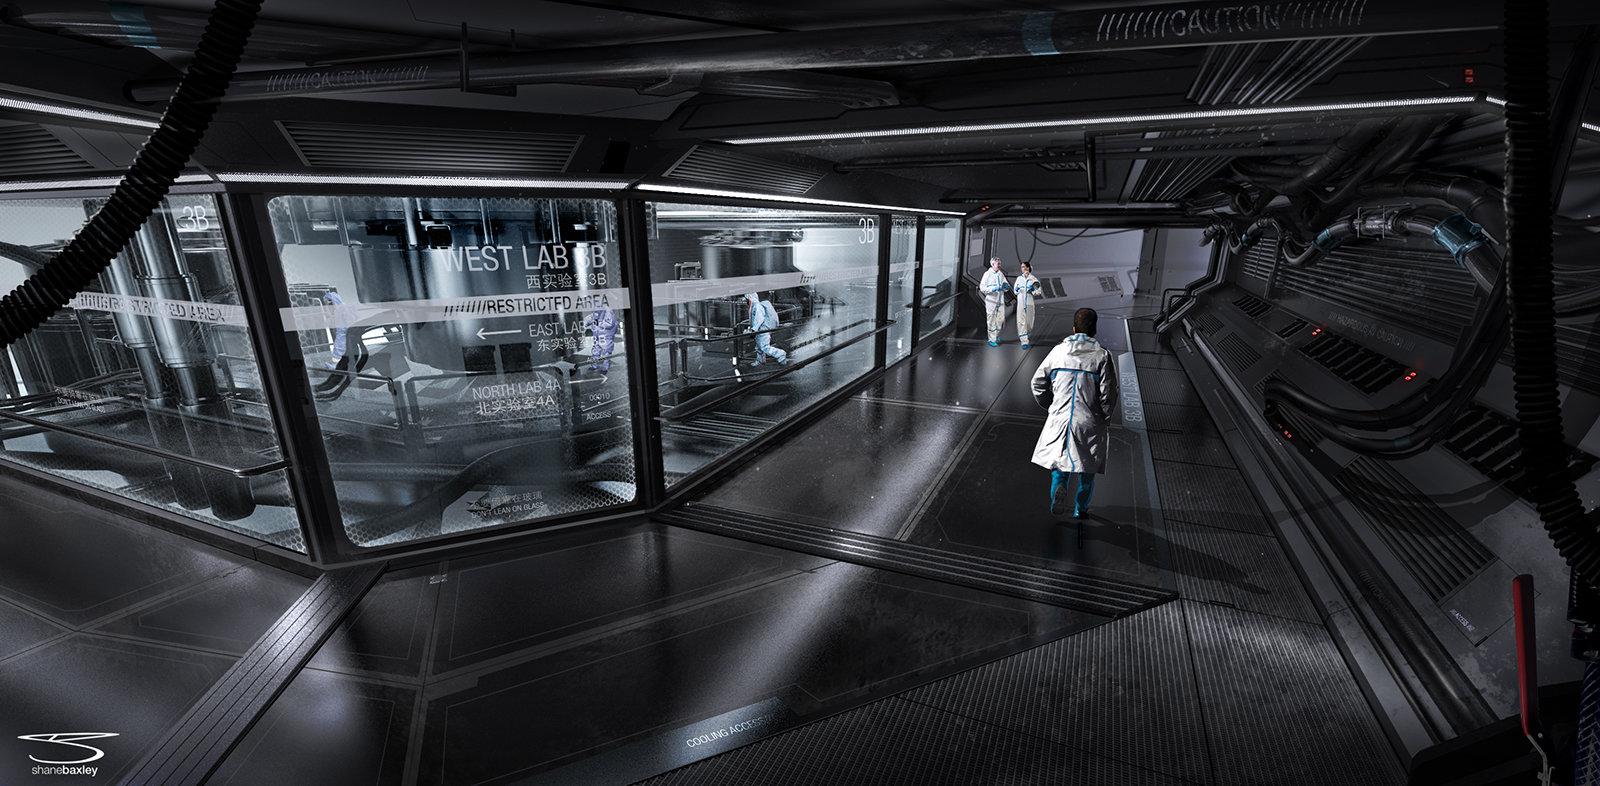 Shane baxley lab interior 1c baxley lorezzed